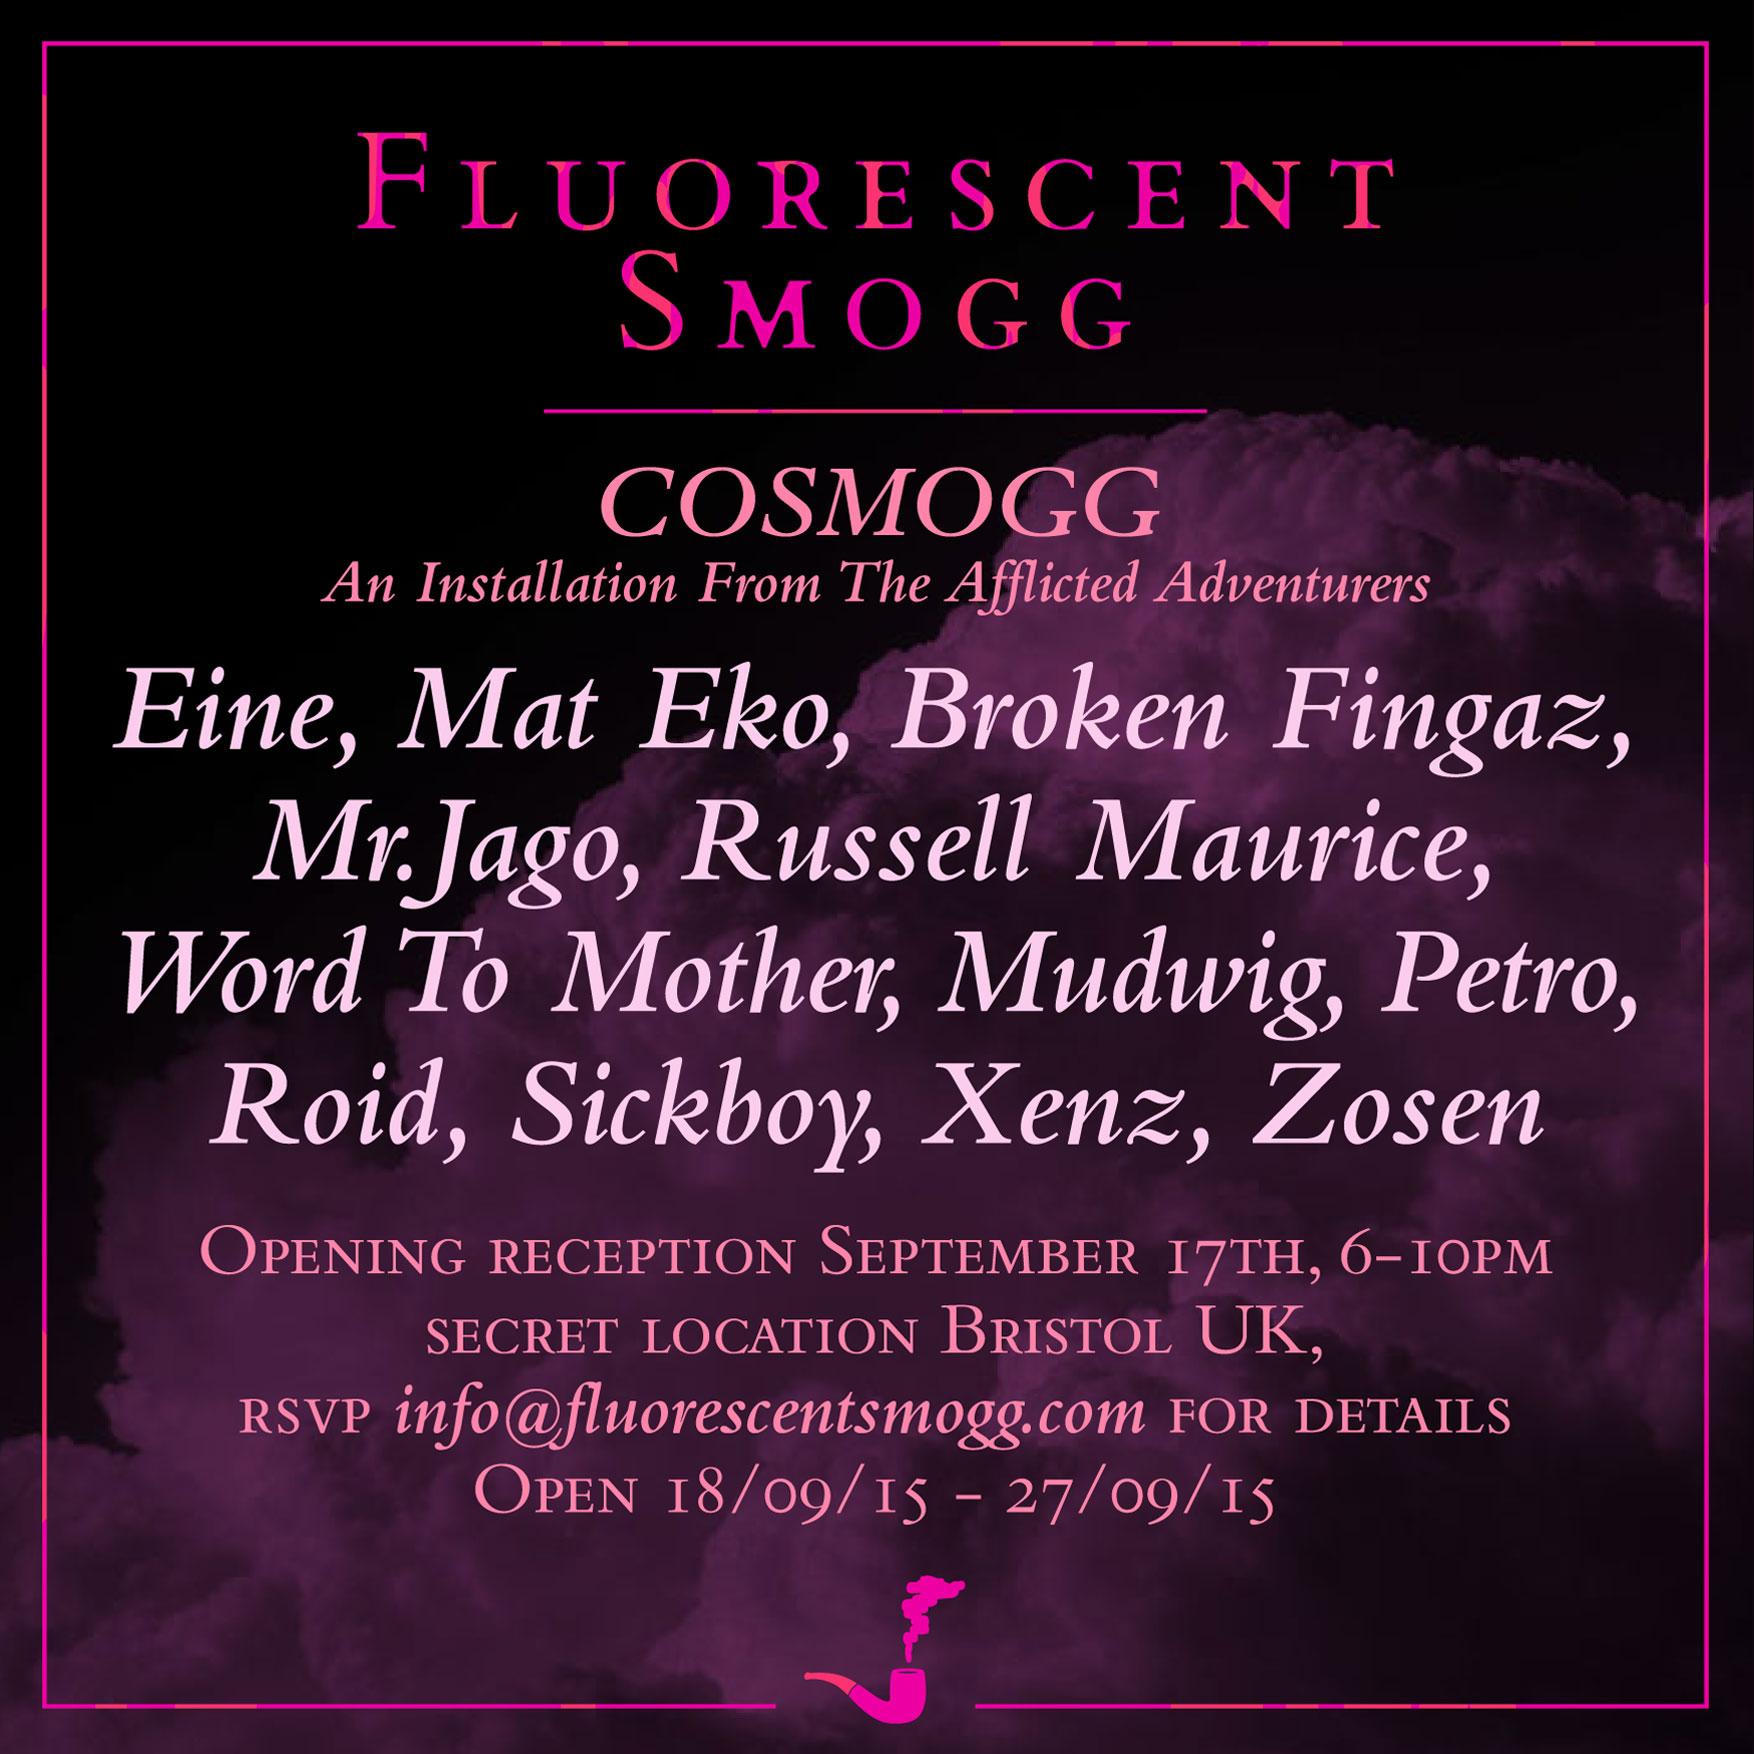 Fluorescent Smogg: Cosmogg